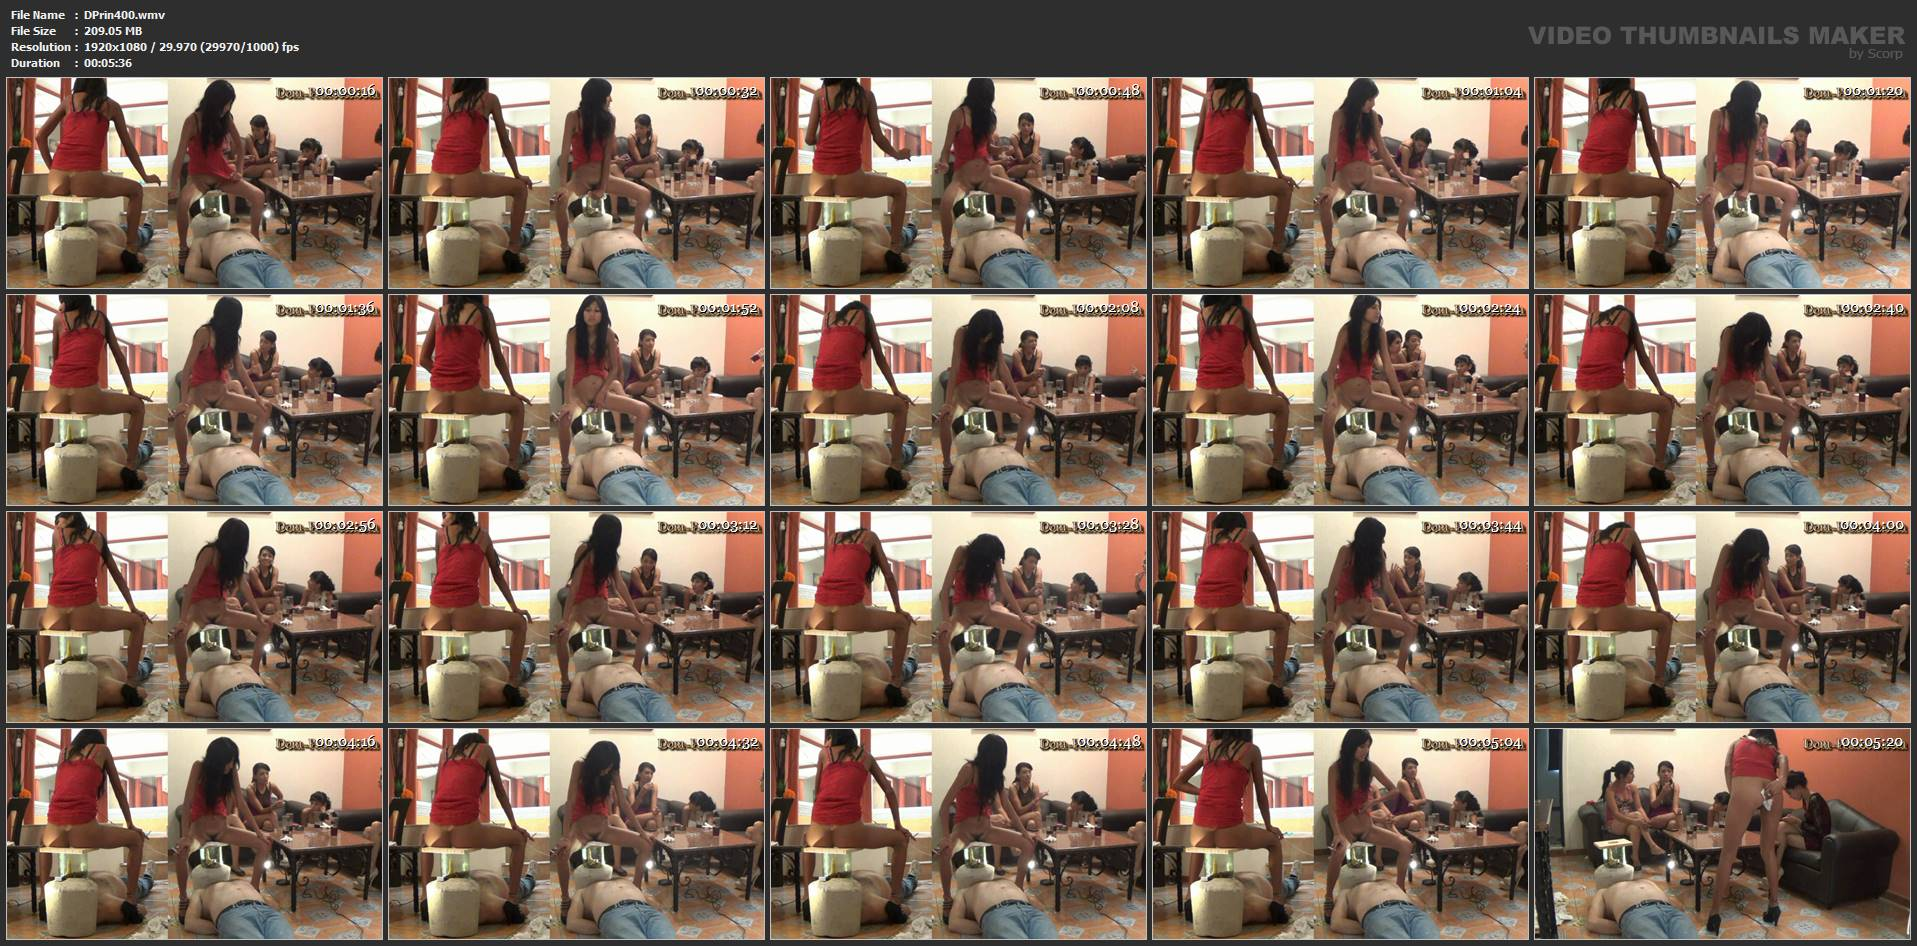 [DOM-PRINCESS] The Poop Collector Part 05 Carmen [FULL HD][1080p][WMV]